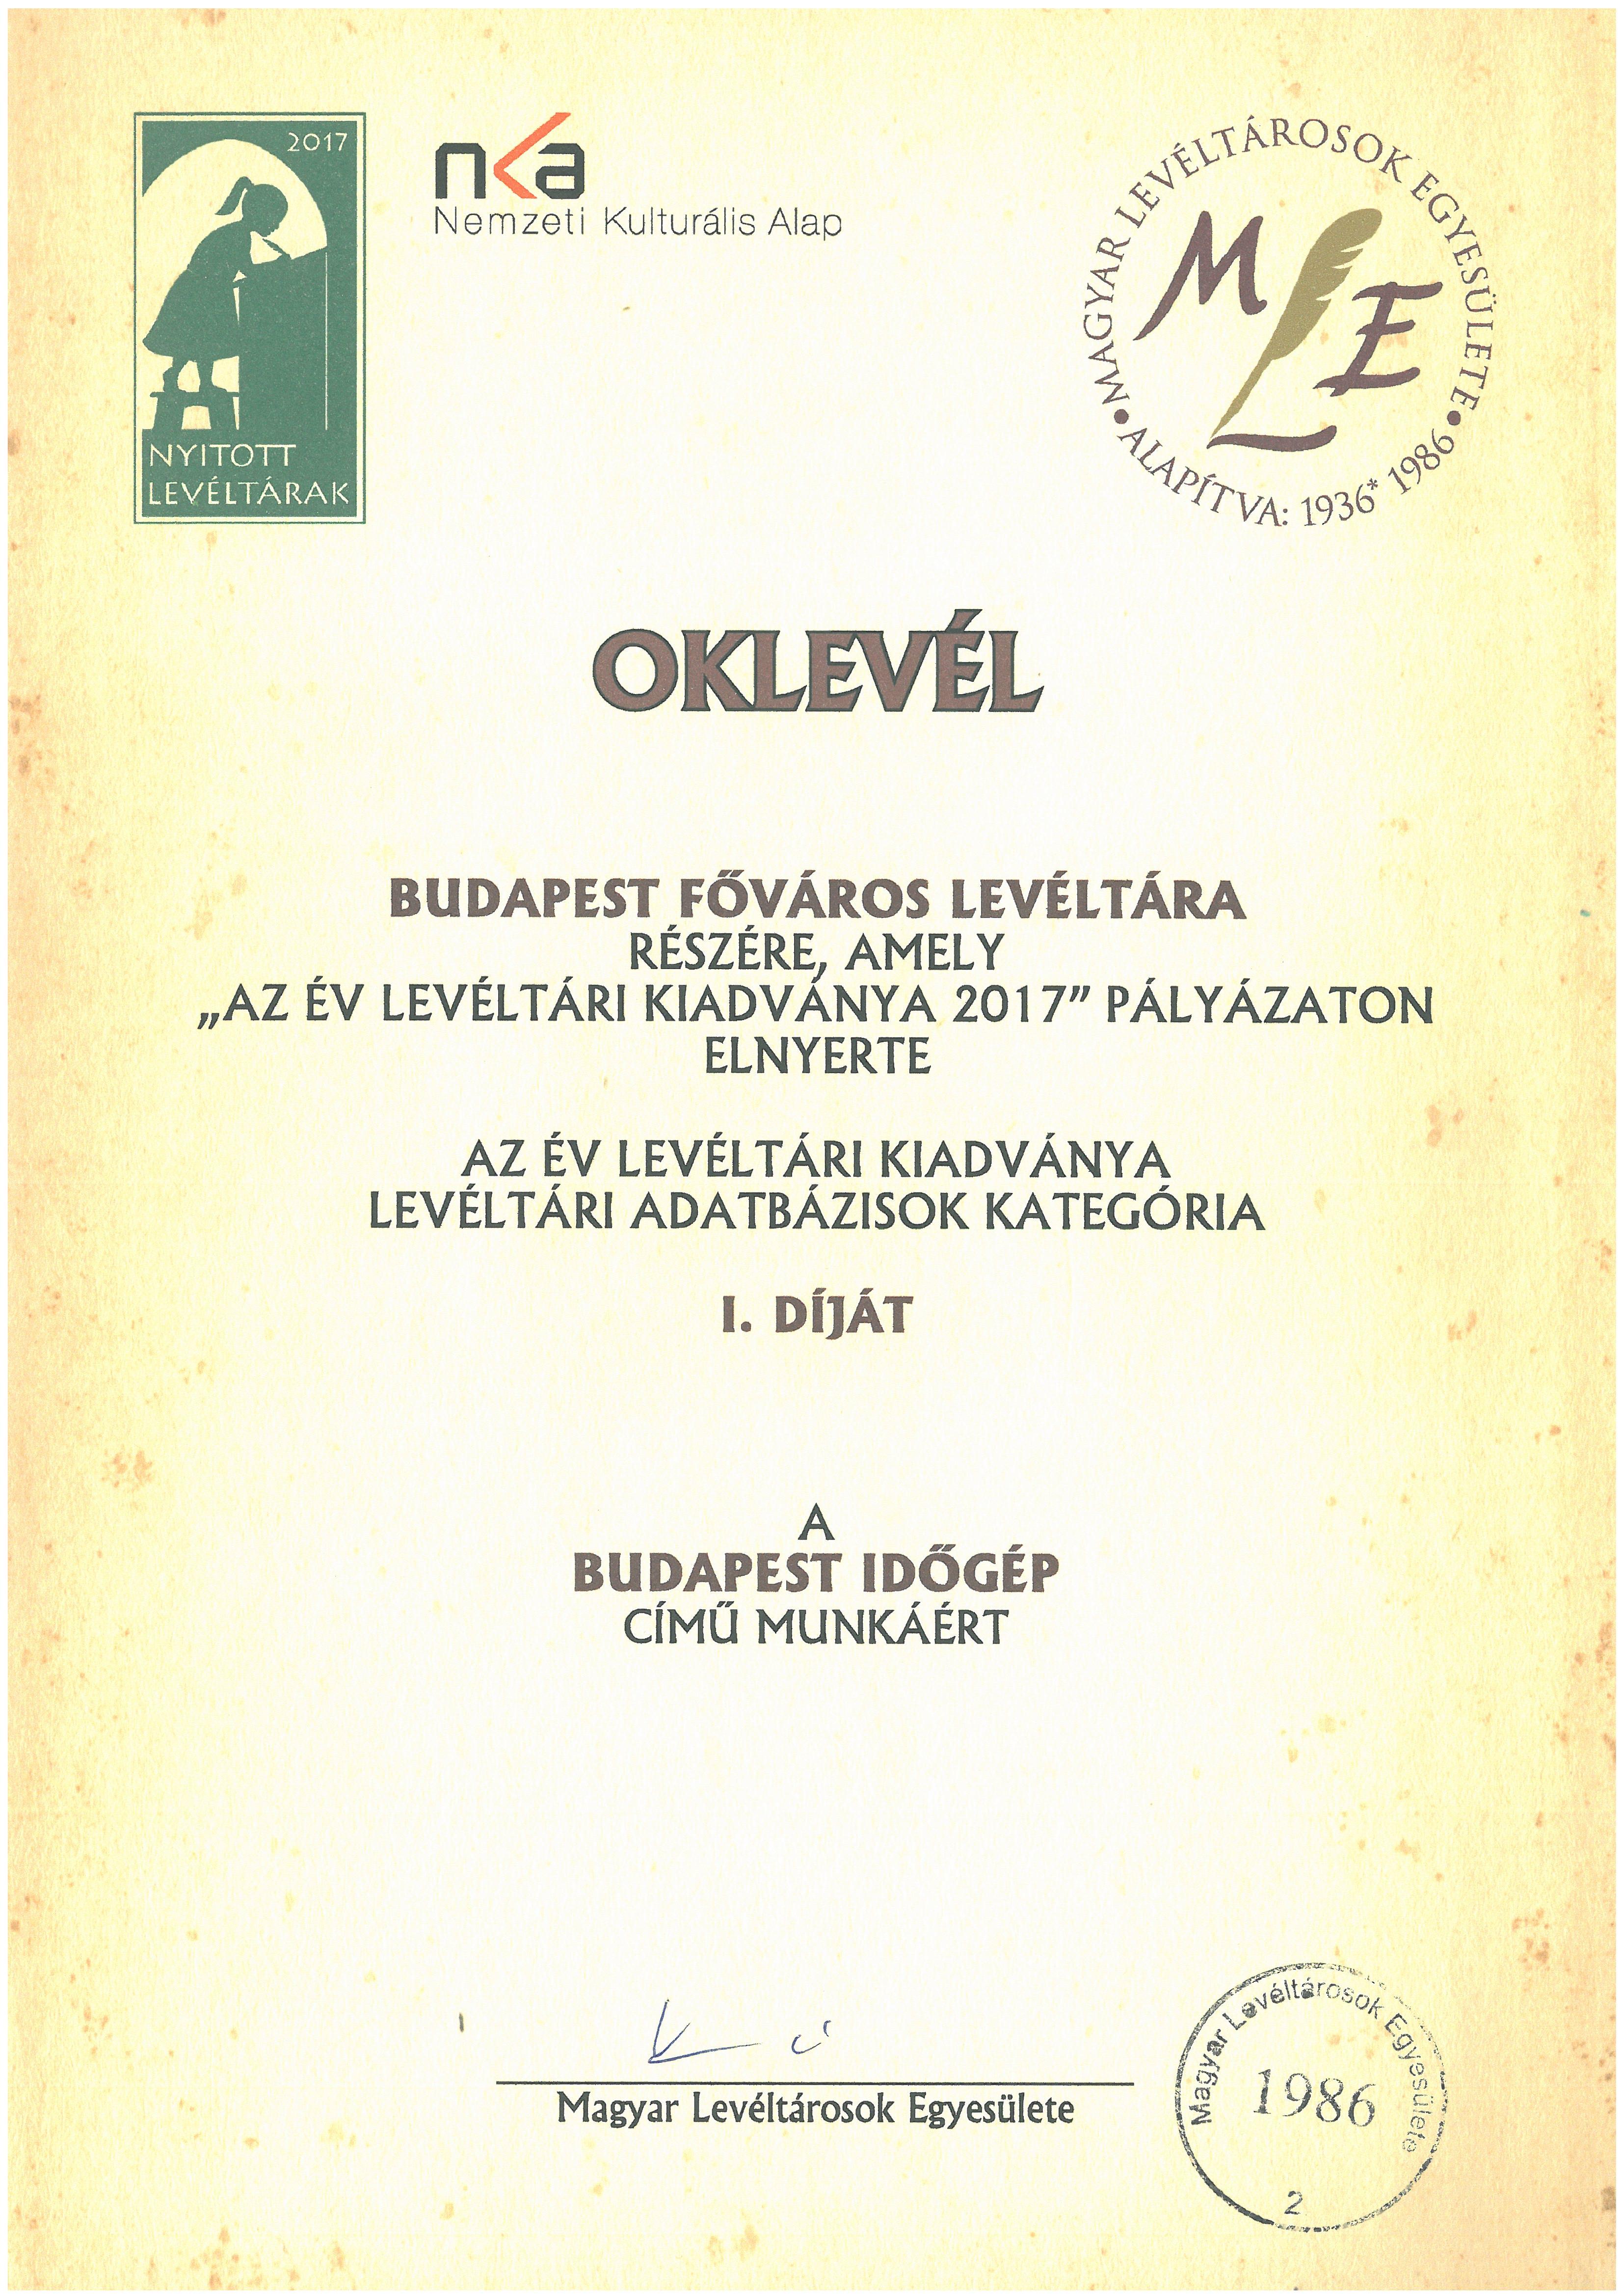 dij_ev_leveltari_kiadvanya_adatbazis.jpg